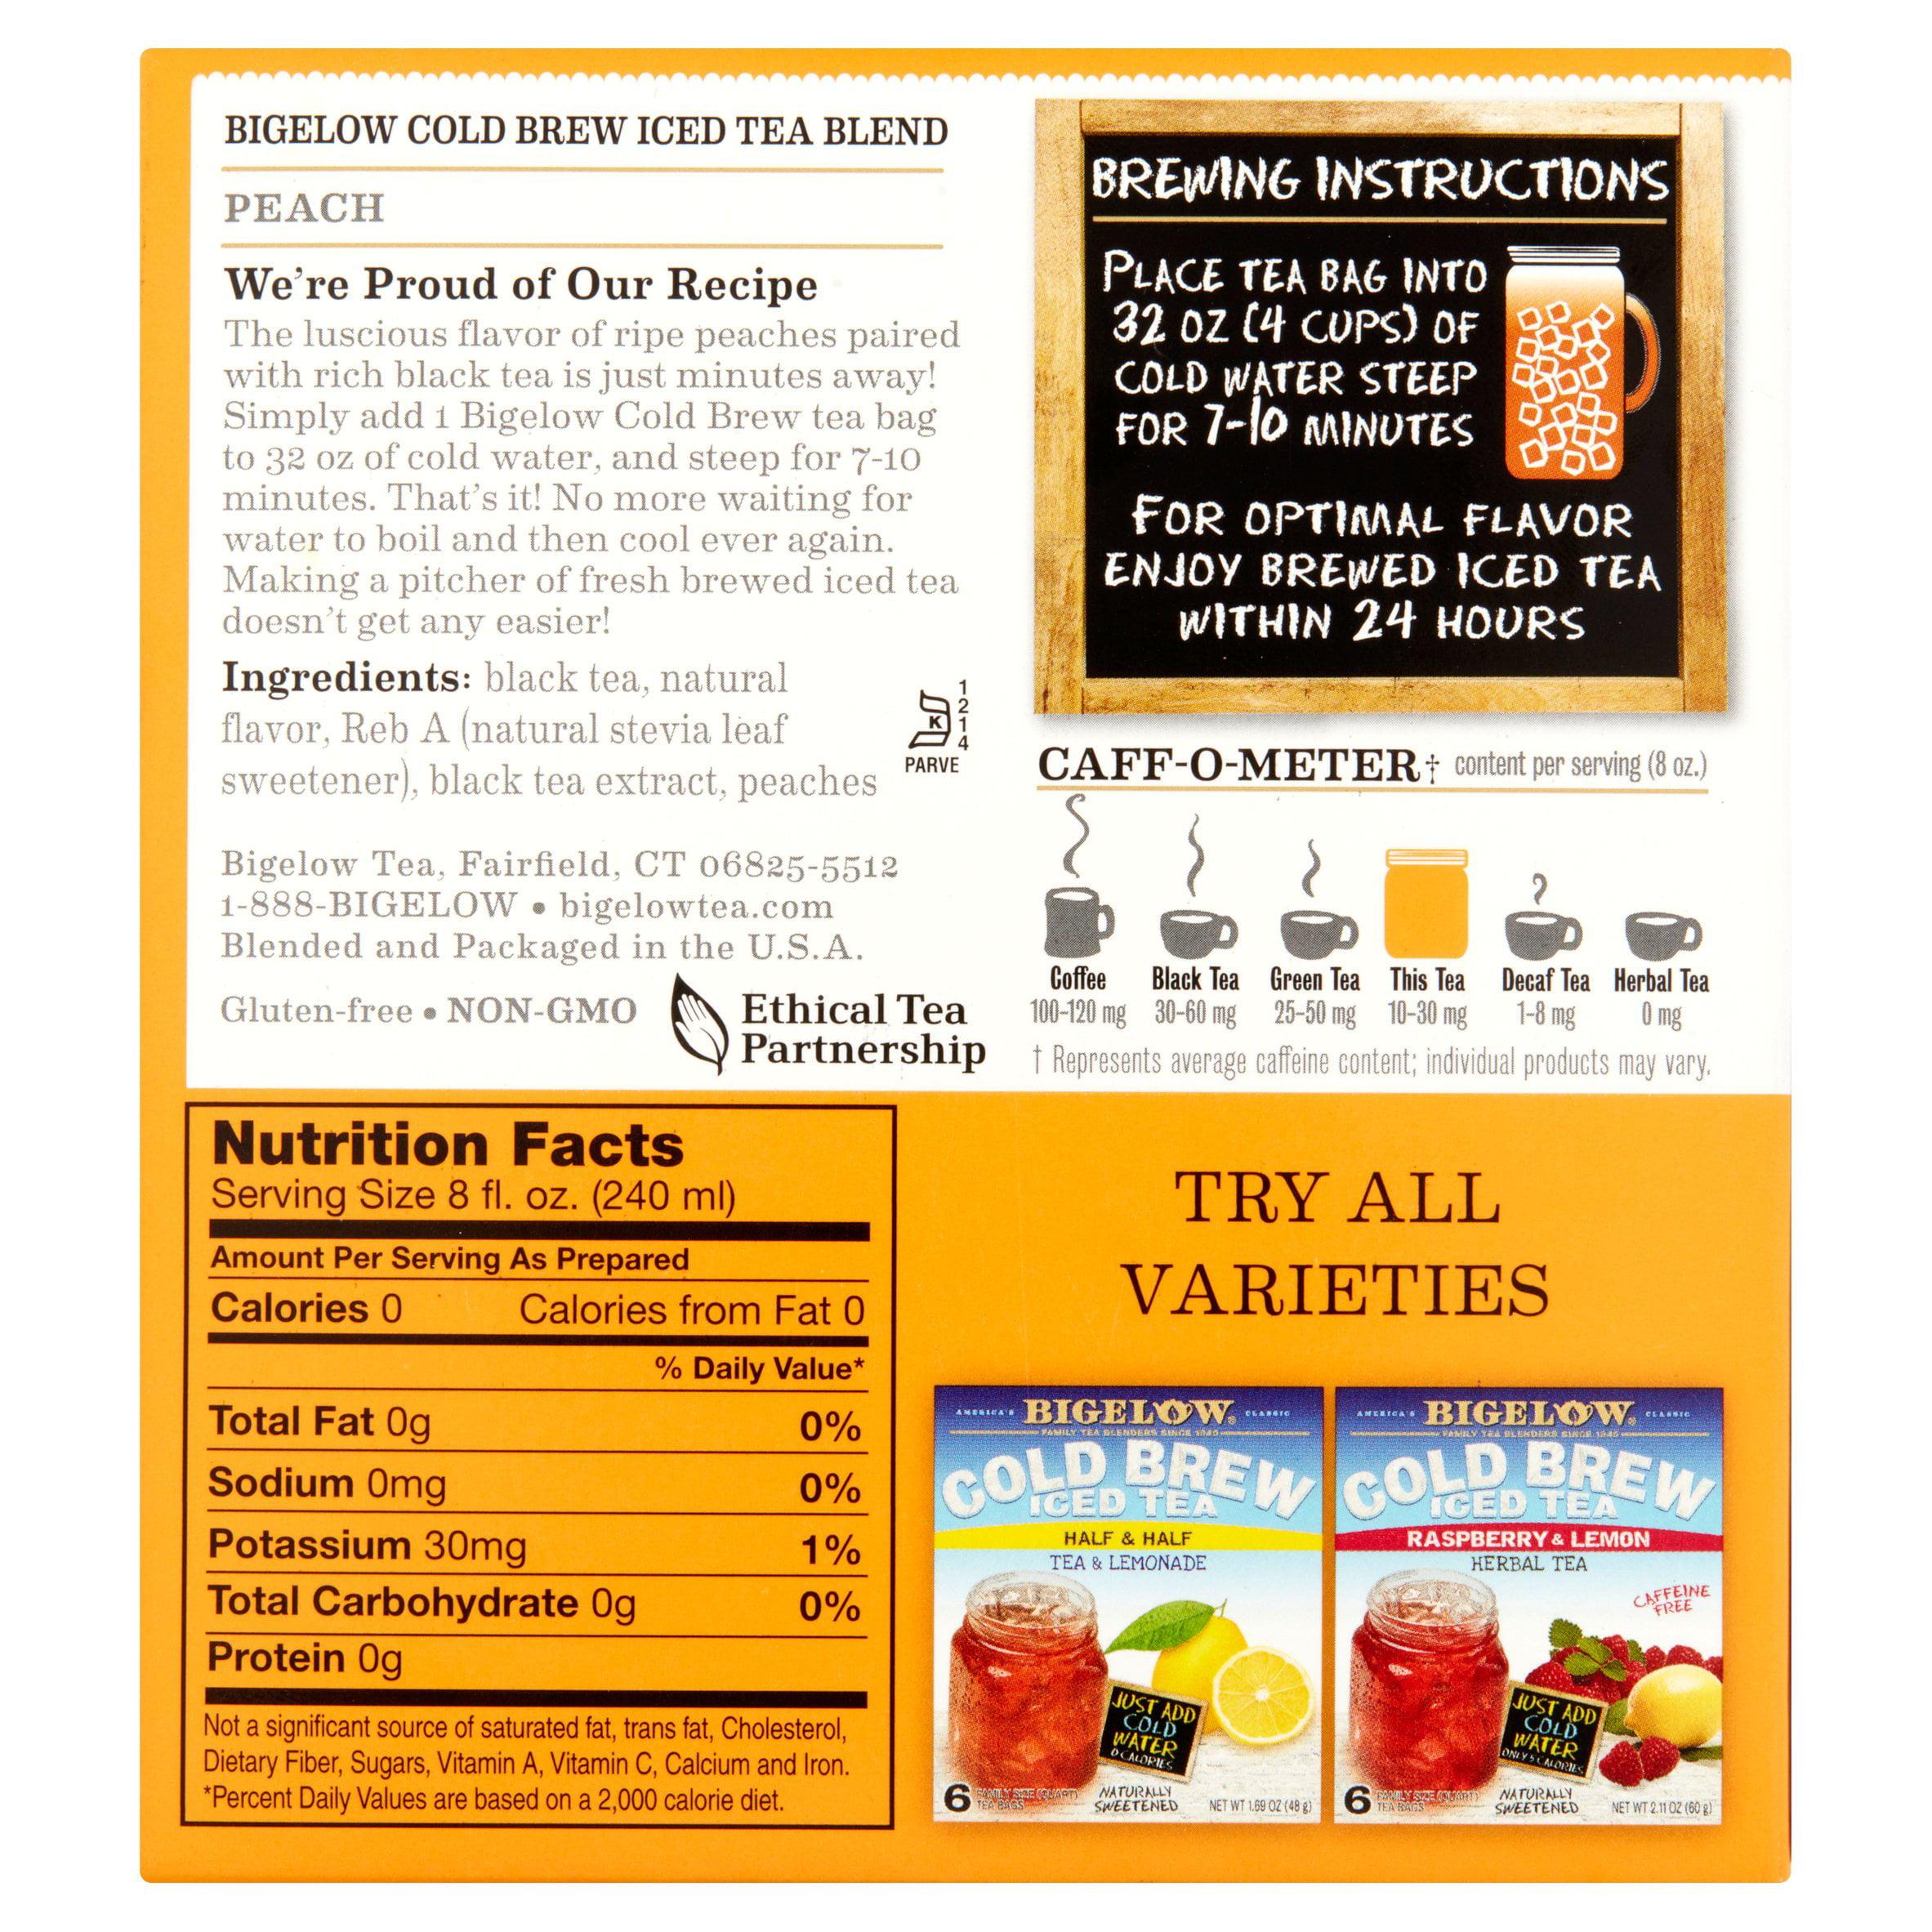 Bigelow herbal tea - Bigelow Cold Brew Iced Tea Peach Black Tea 6 Ct 1 69 Oz Walmart Com